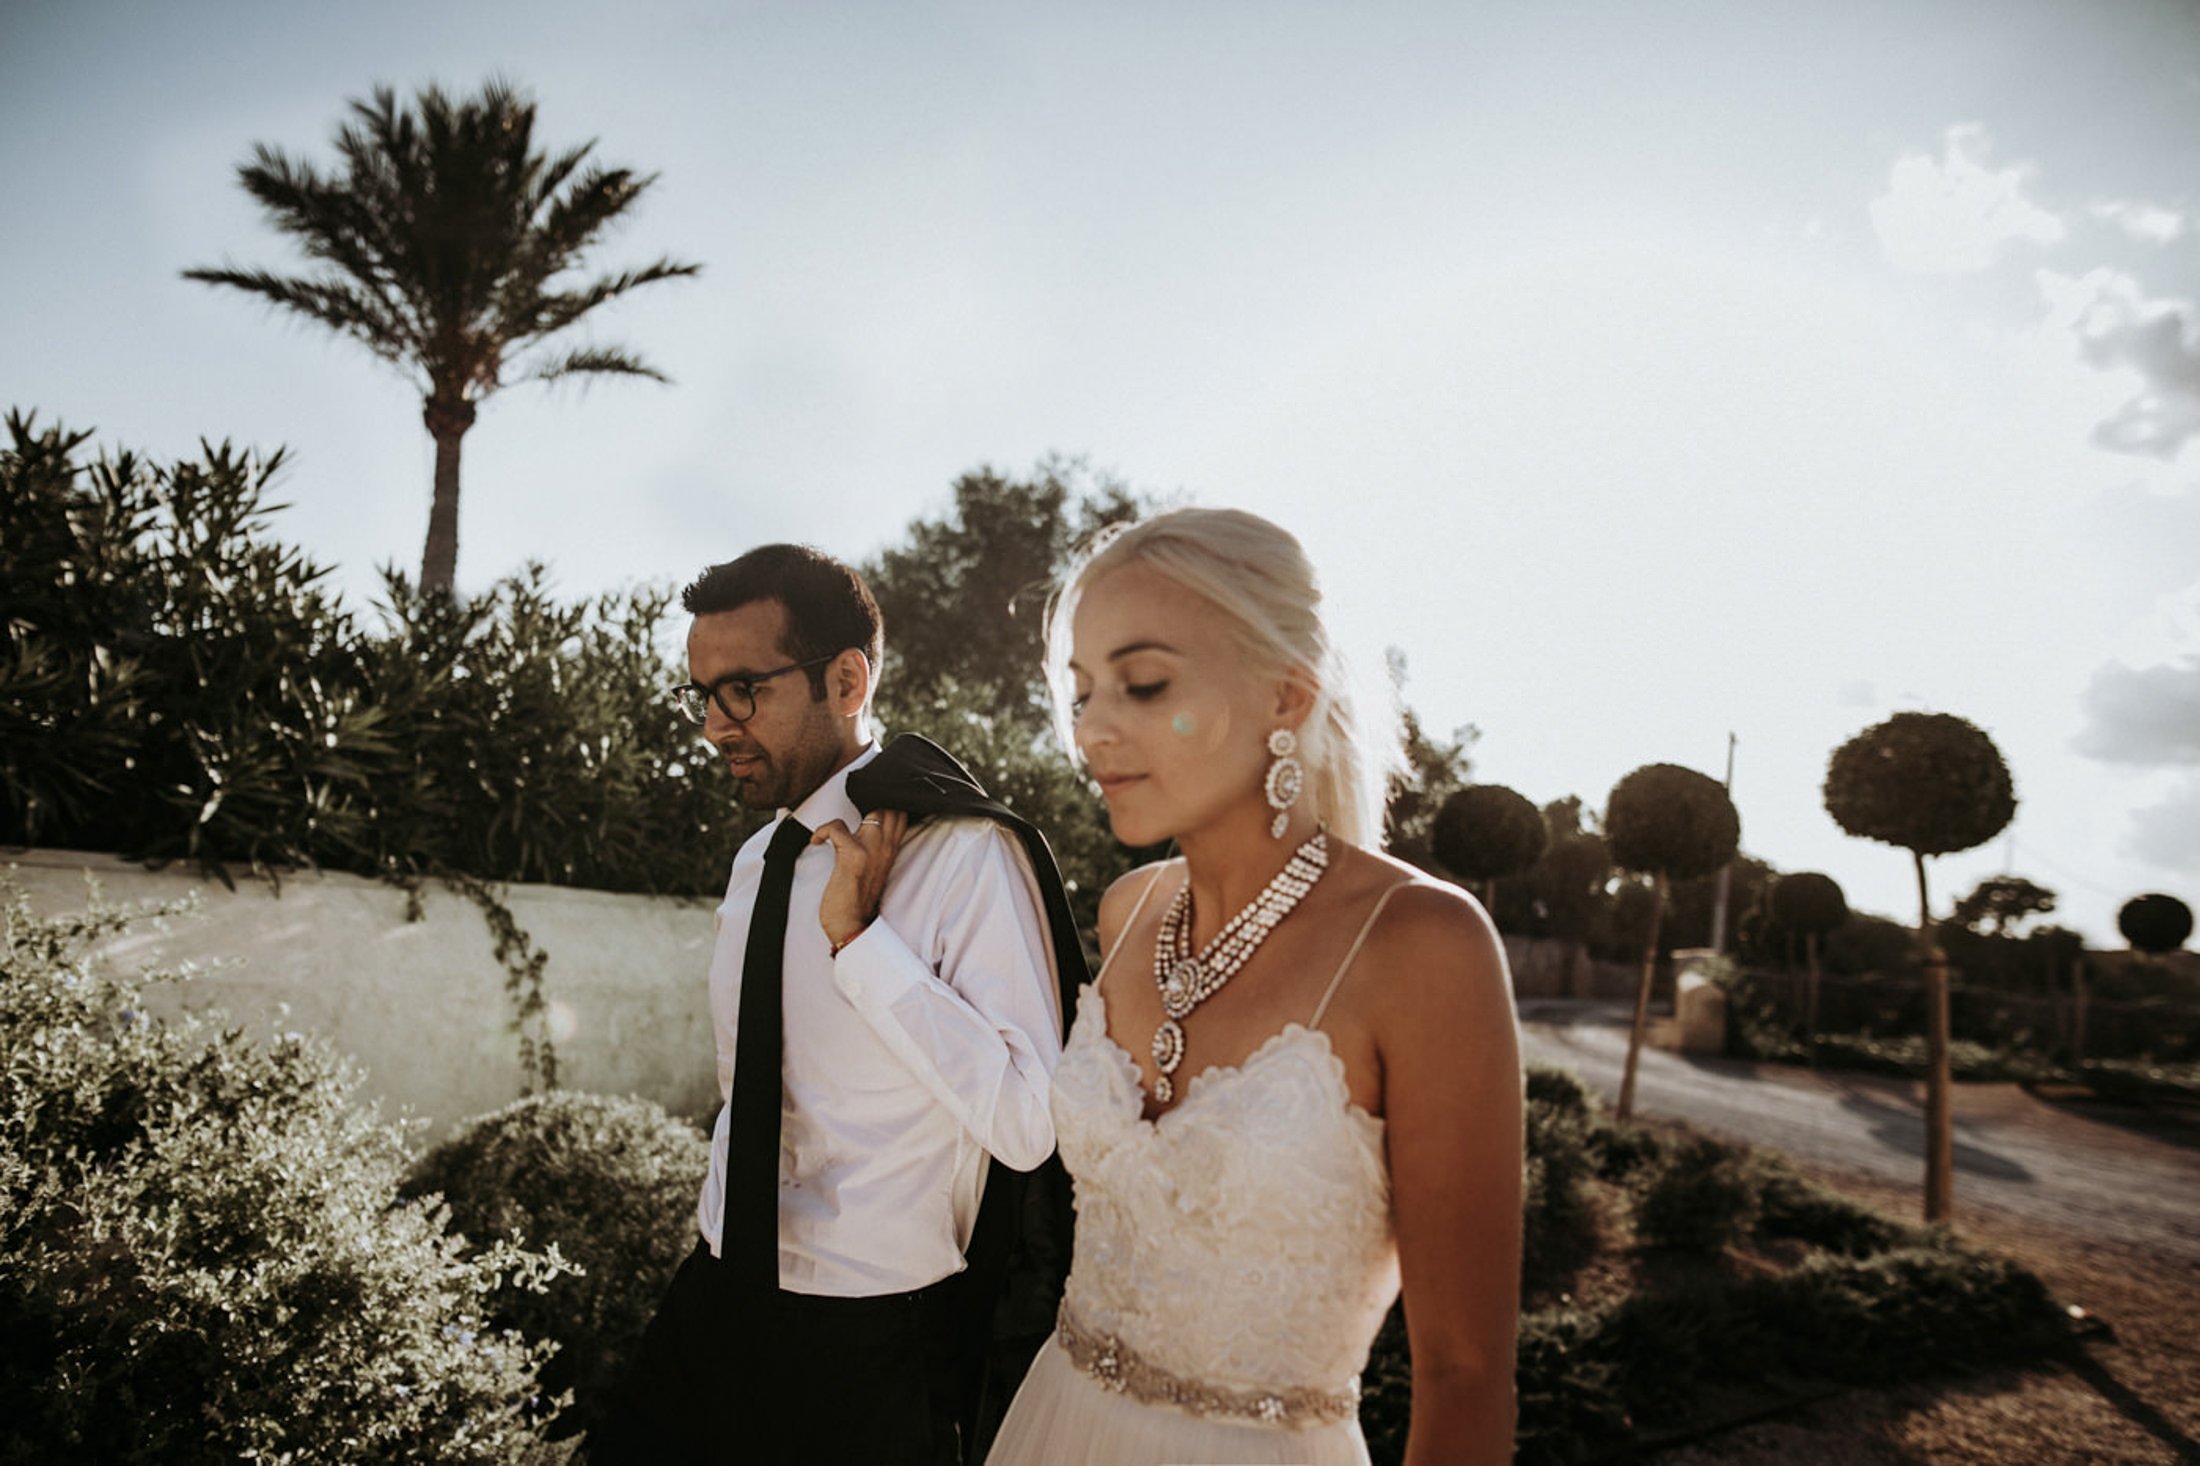 Wedding_Photographer_Mallorca_Daniela-Marquardt_Photography_New_York_Iceland_Tuscany_Santorini_Portugal_Austria_Bavaria_Elopement_Hochzeitsfotograf_AntjeRajat2_94